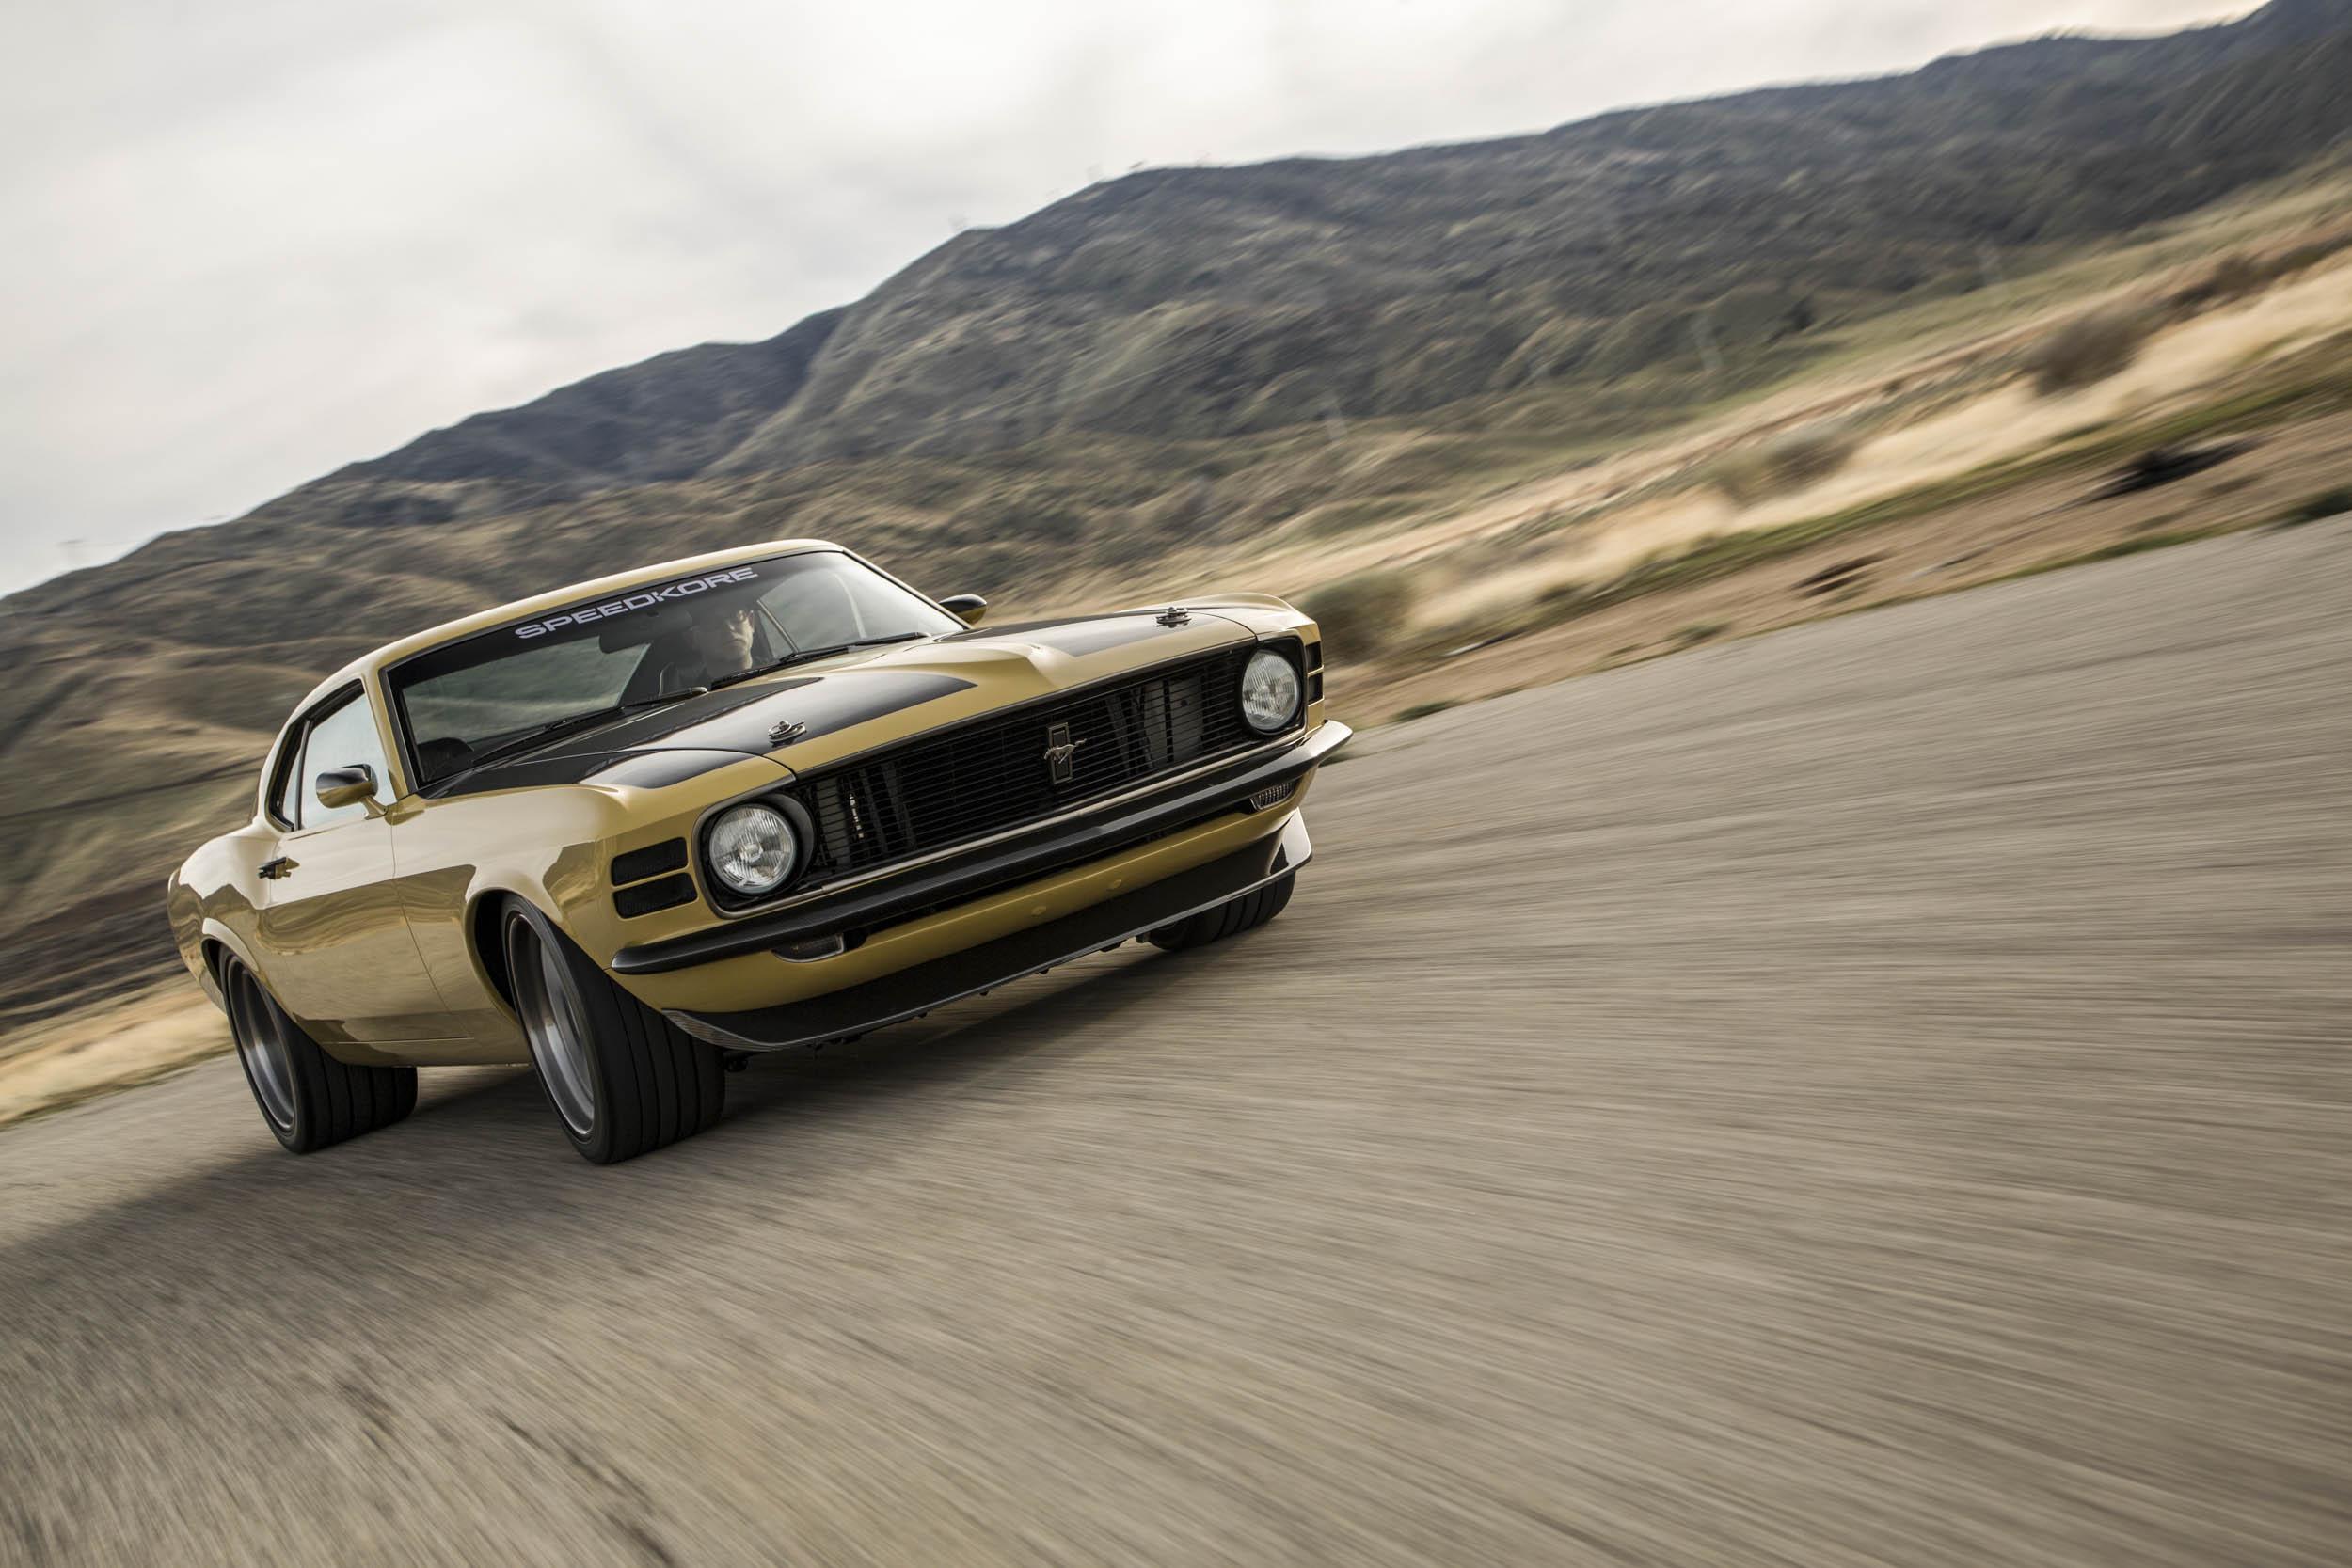 Robert Downey Jr.'s Speedkore 1970 Mustang driving